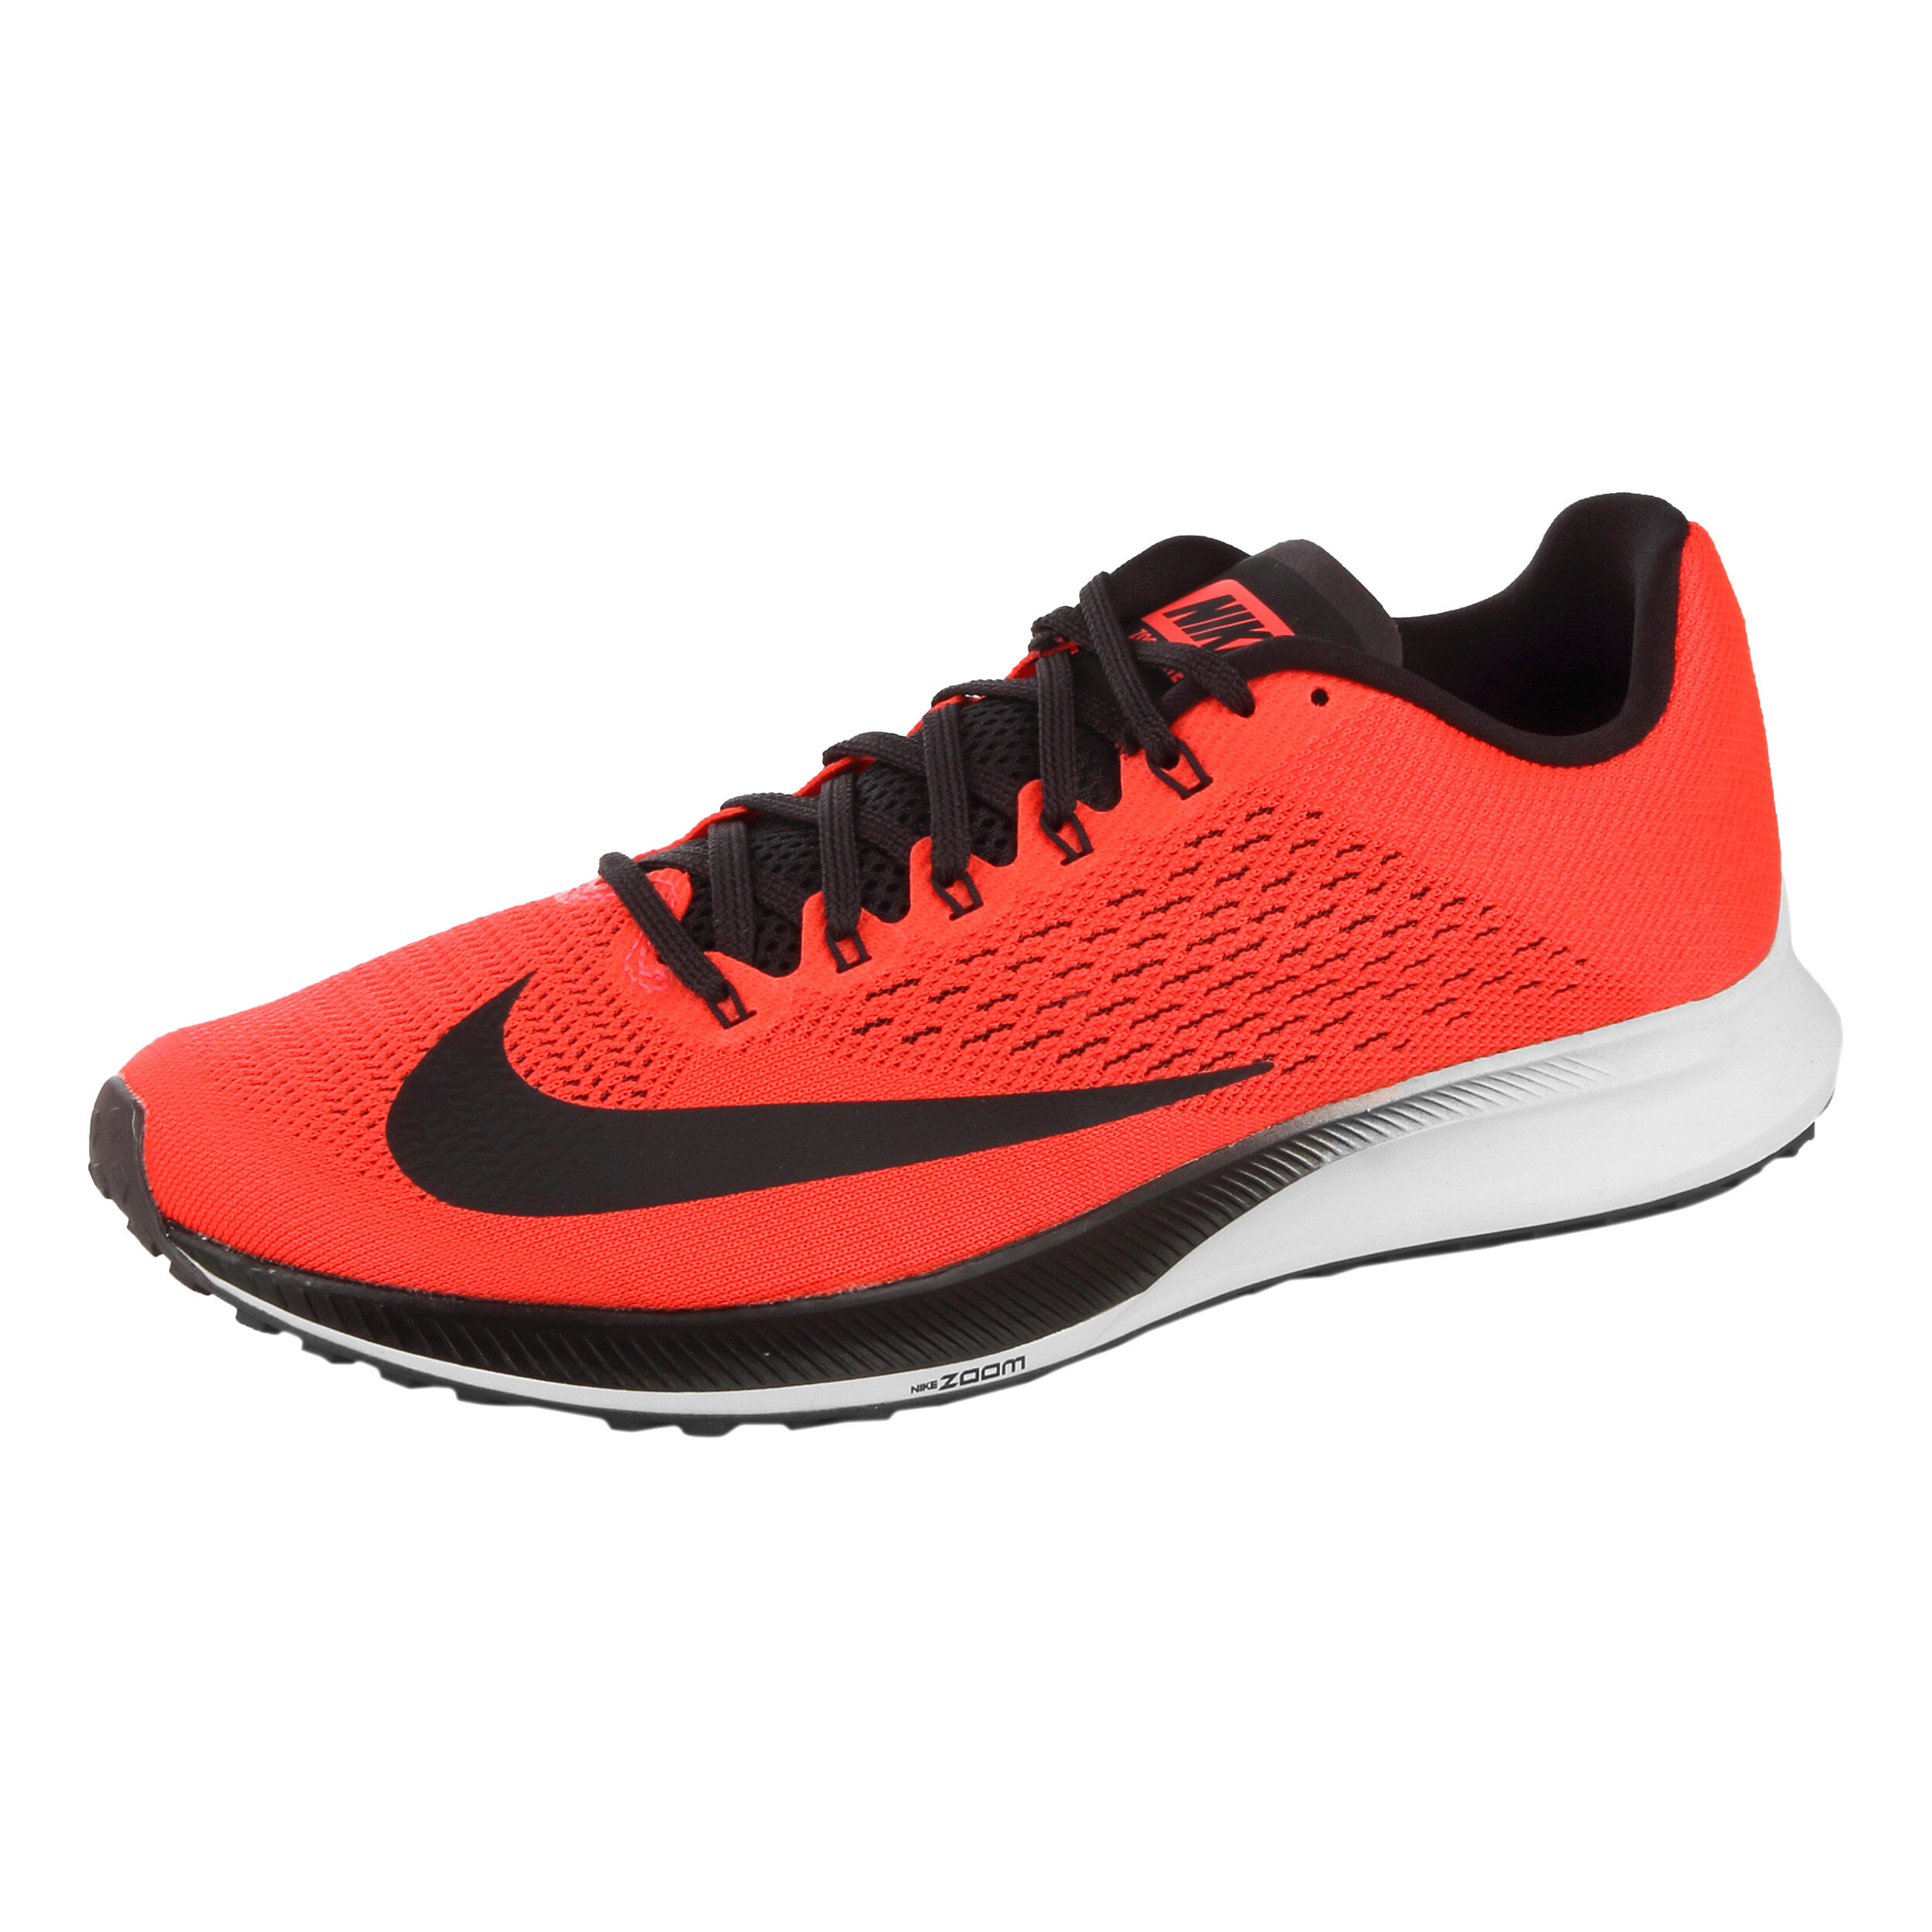 Air Nike Herren Elite 10 Zoom RotSchwarz Neutralschuh Y2eWEHD9I